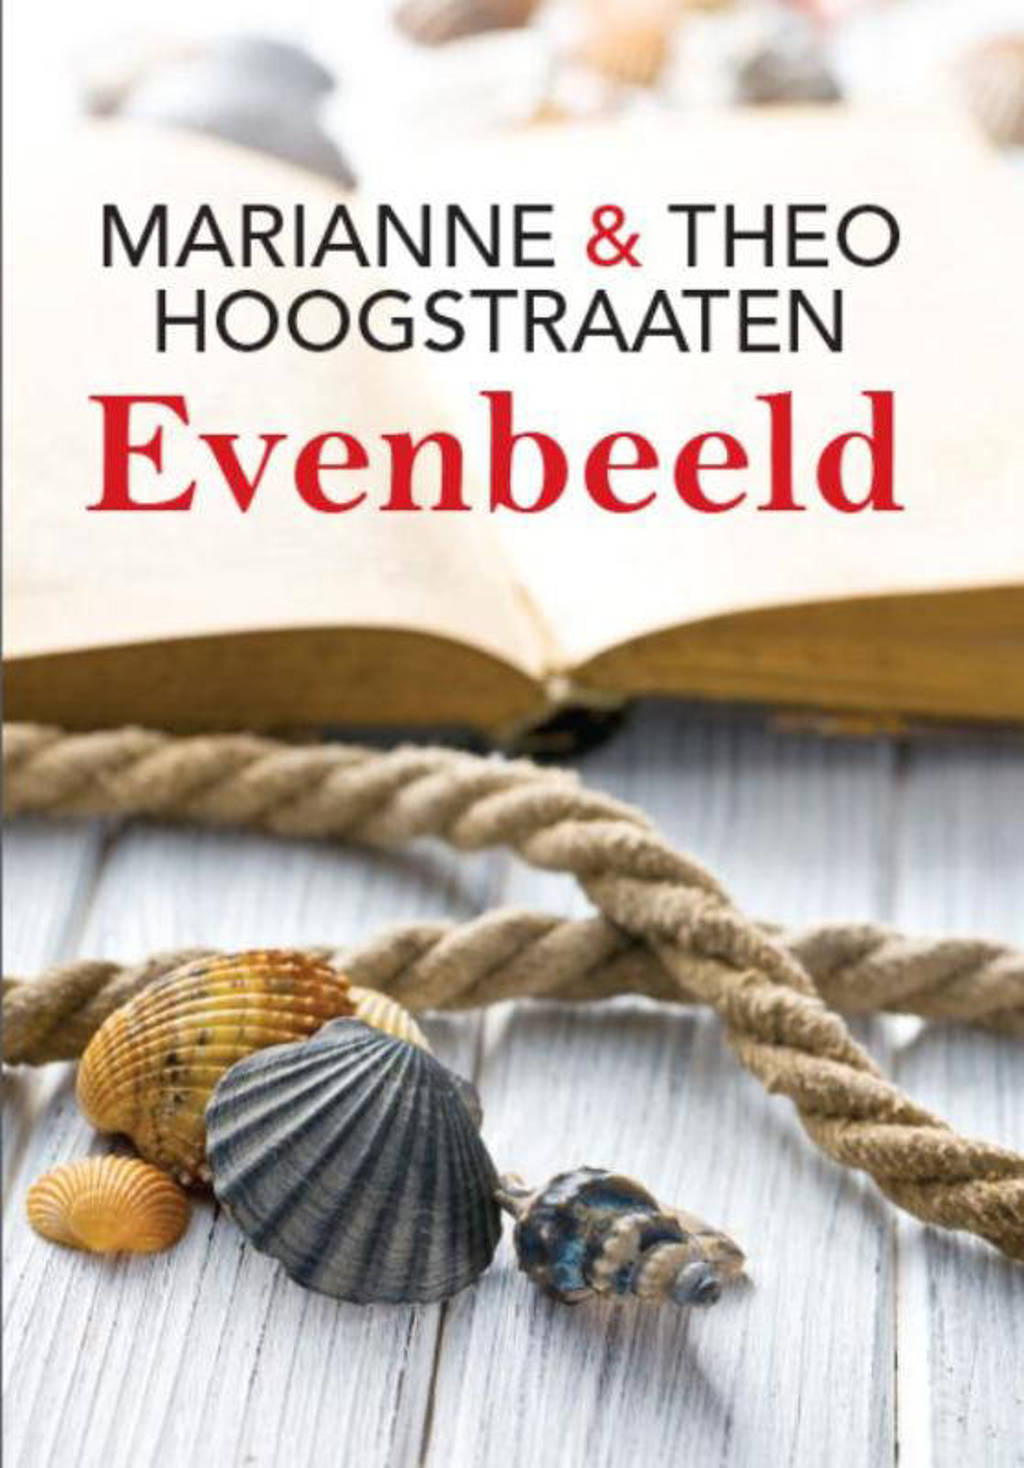 Evenbeeld - Marianne Hoogstraaten en Theo Hoogstraaten